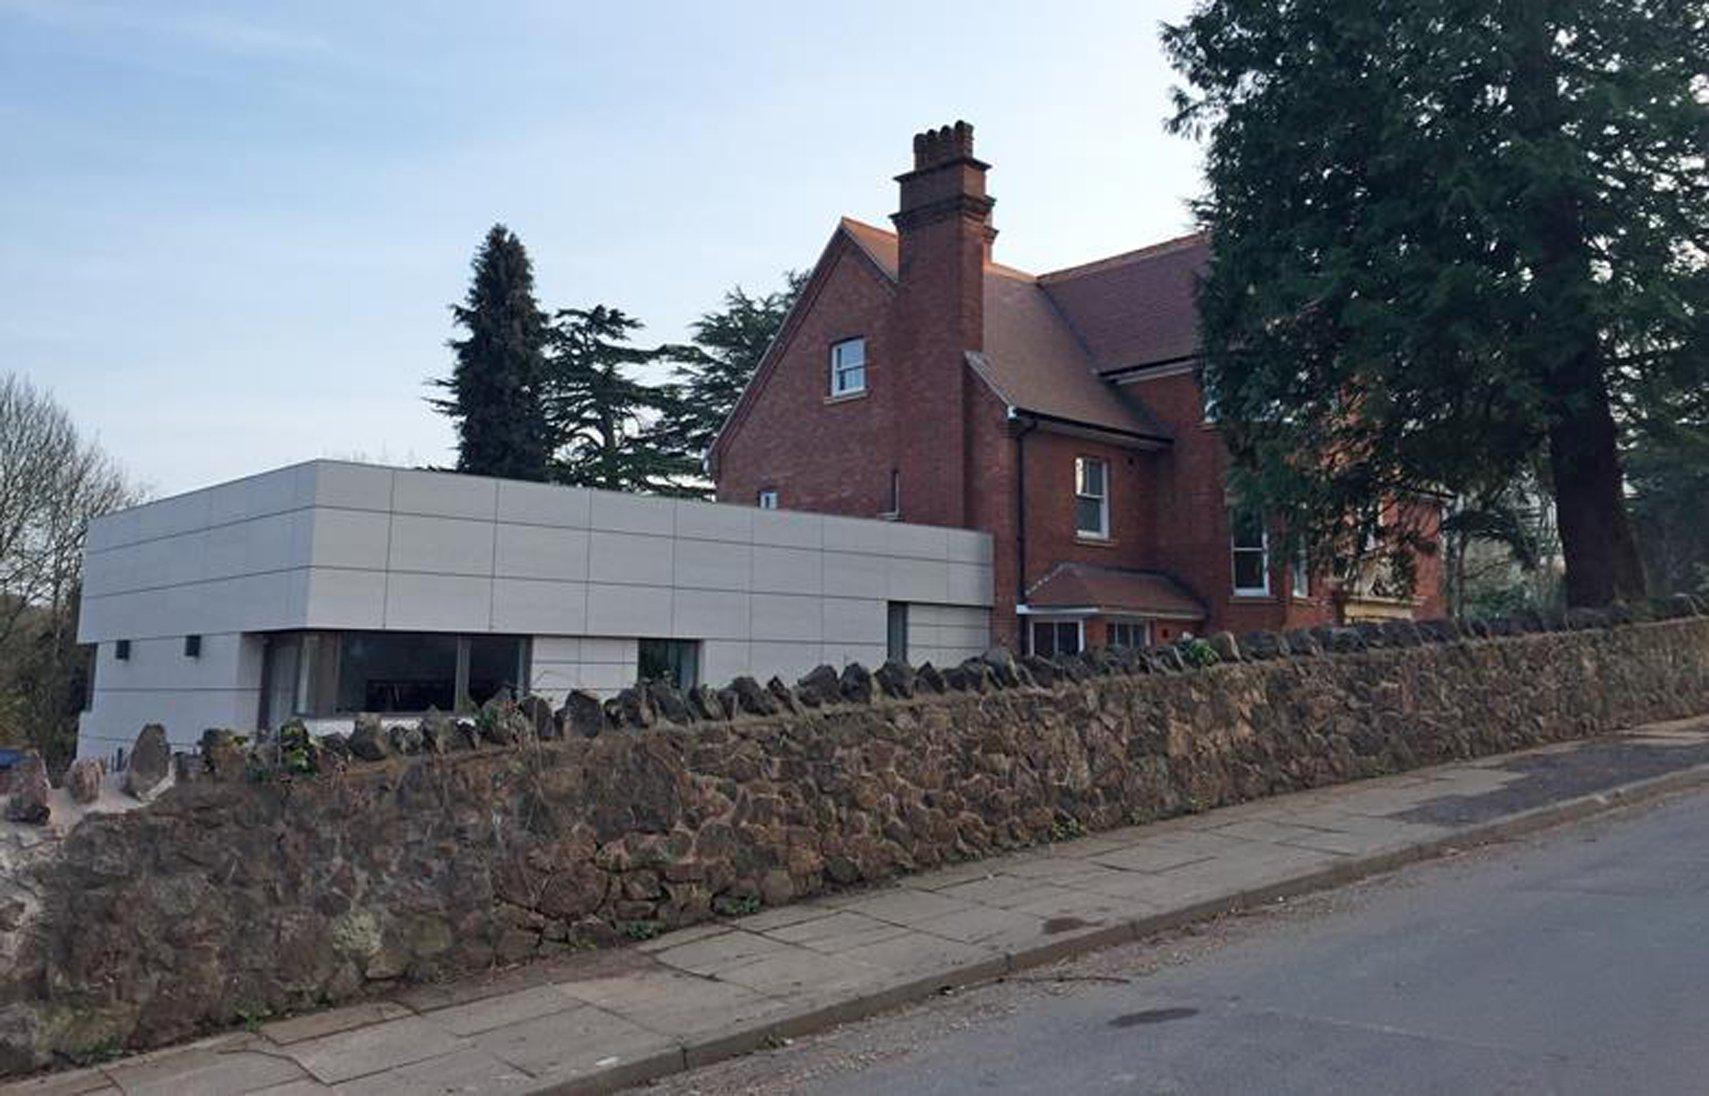 8 Somers Road (Malvern) de Vivid Architects